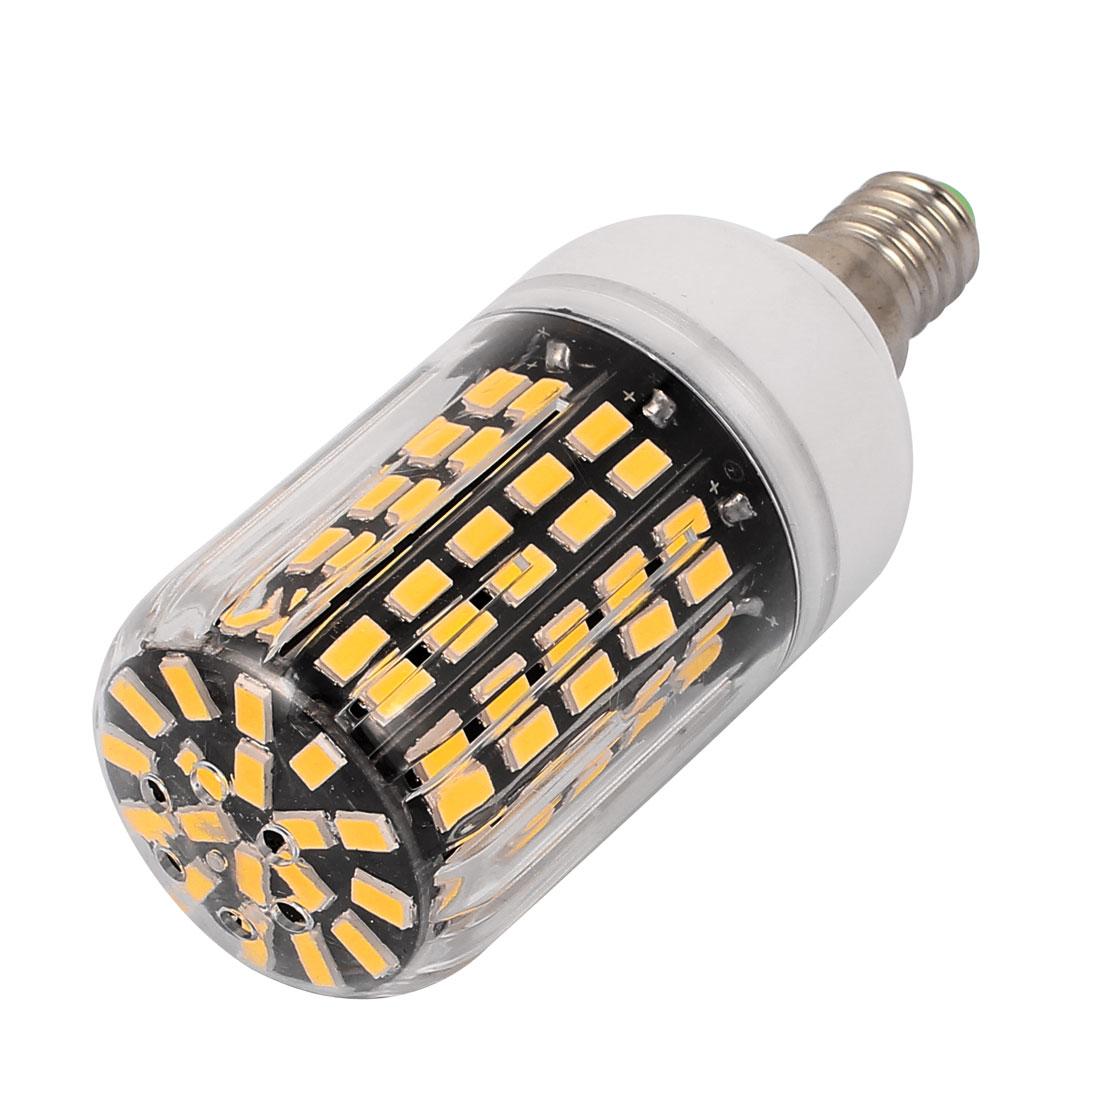 AC 220V Super Bright E14 12W 108 x 5733SMD Energy Saving Corn Bulb Lamp Warm White